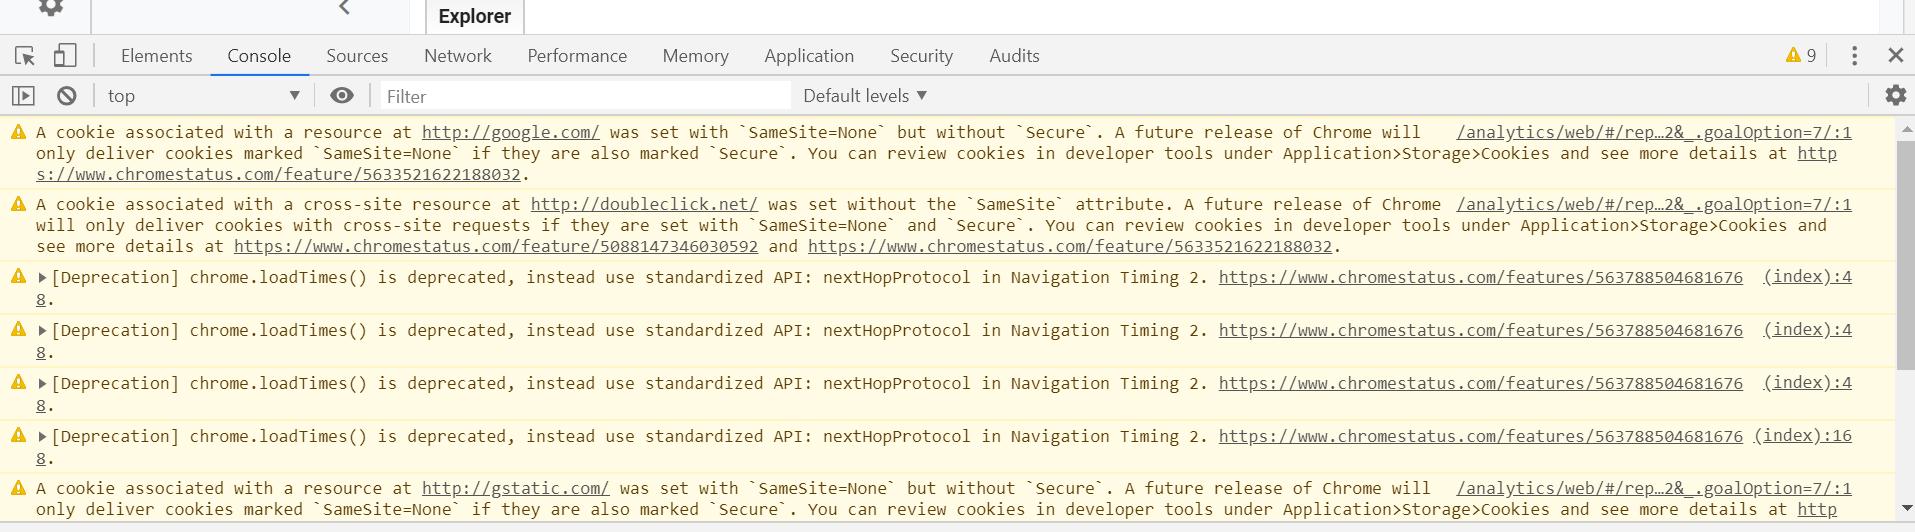 Mixed_content_errors_inspect